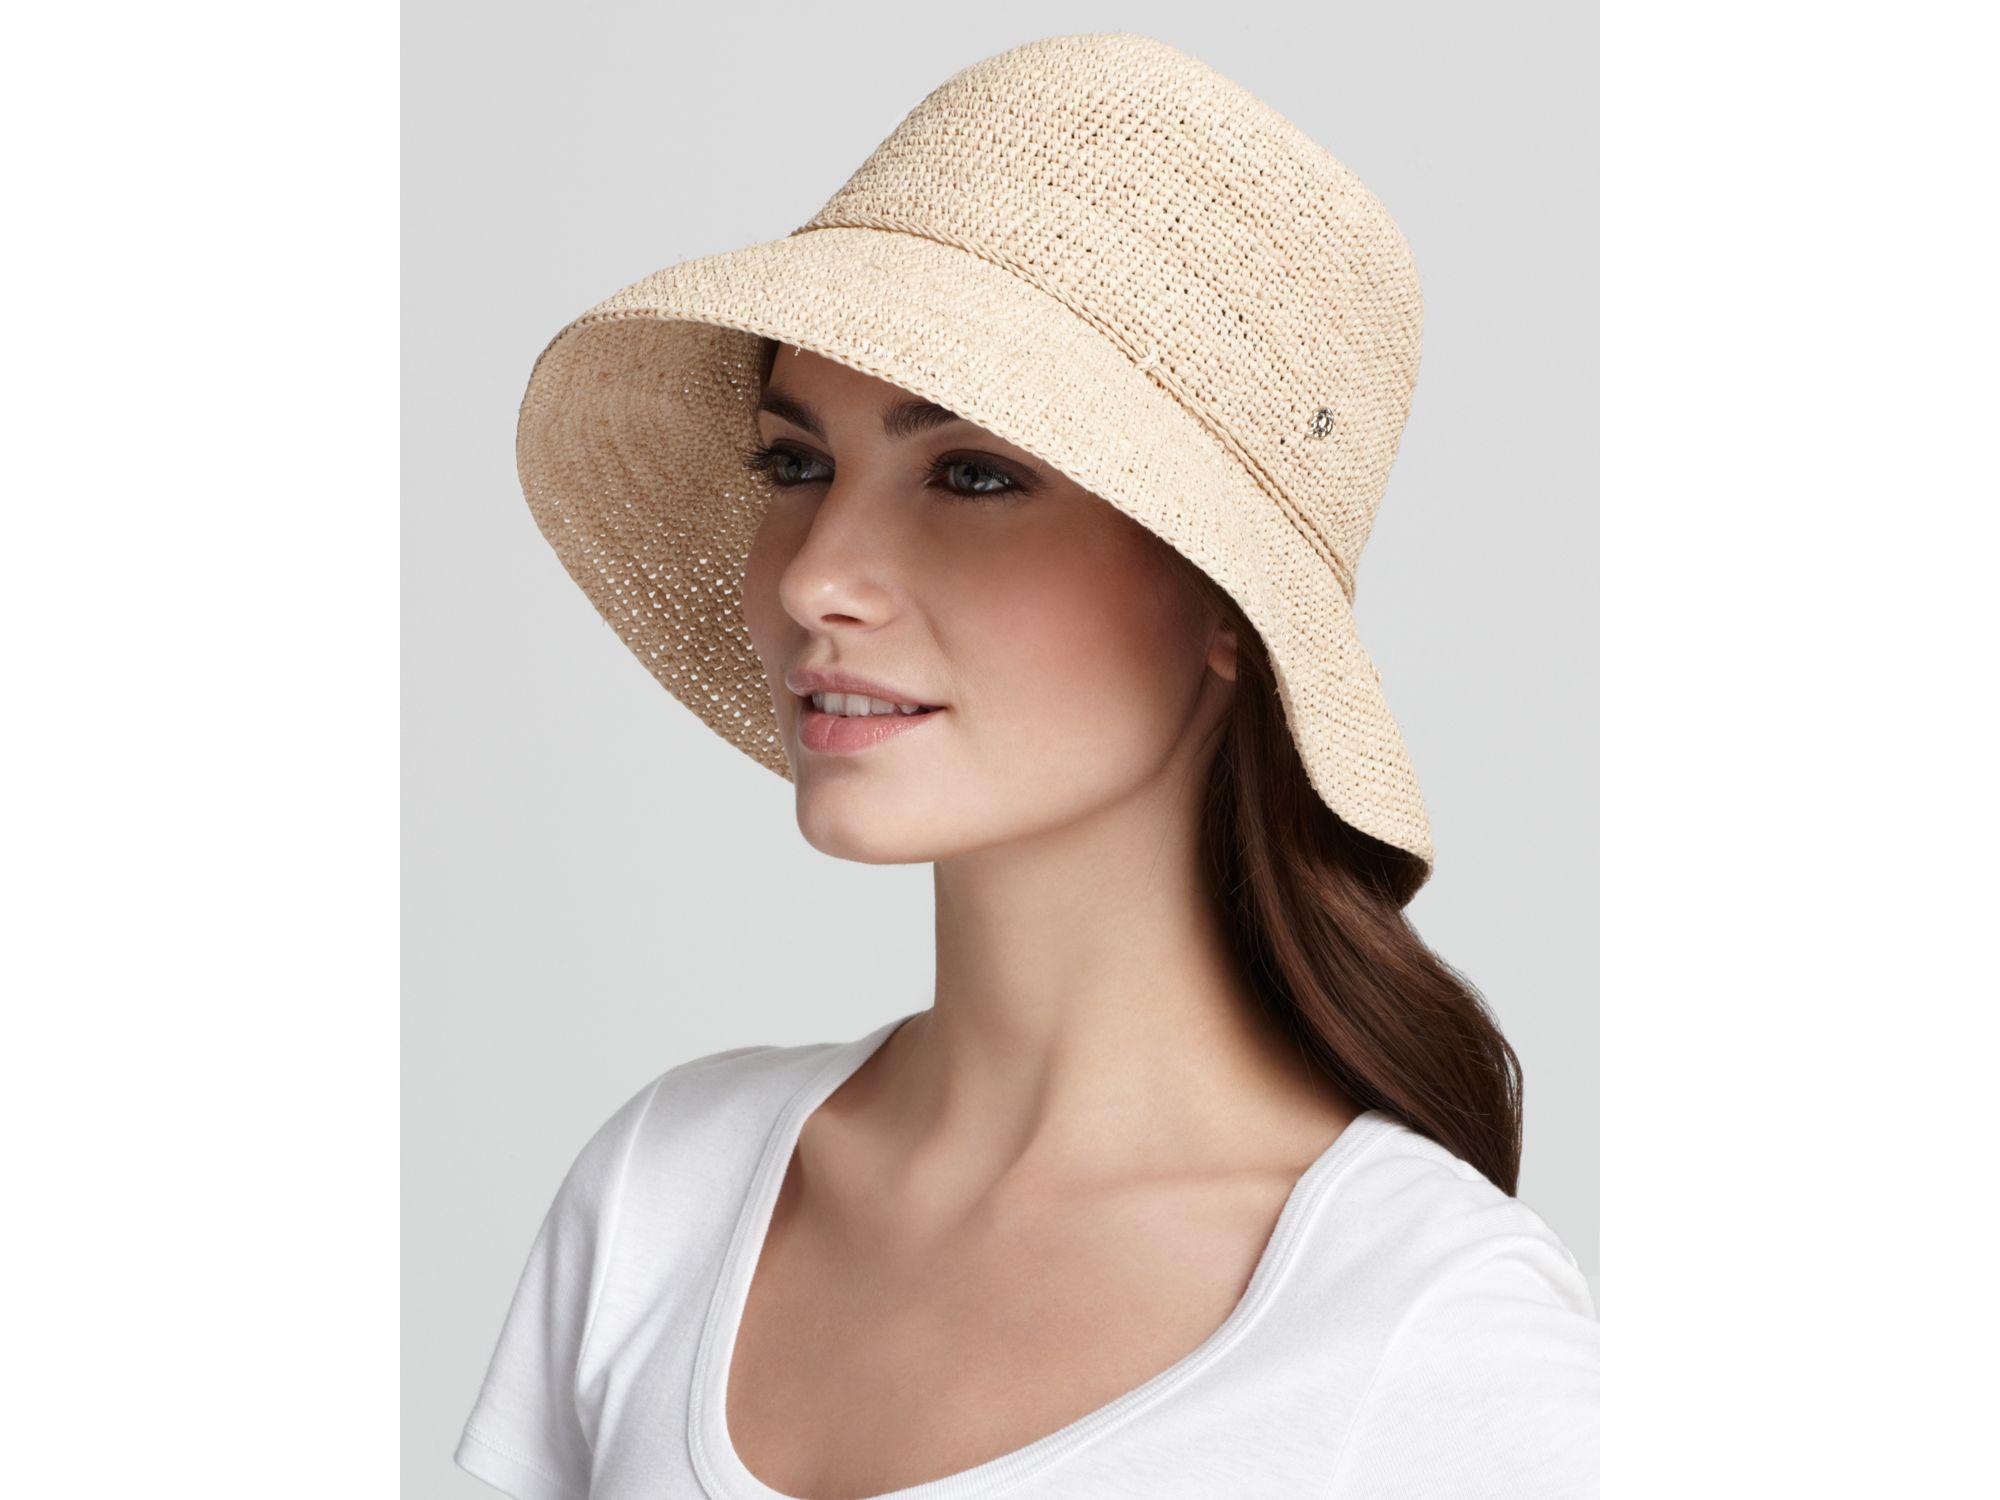 a77727317cd23 Helen Kaminski Provence 8 Raffia Hat in Natural - Lyst